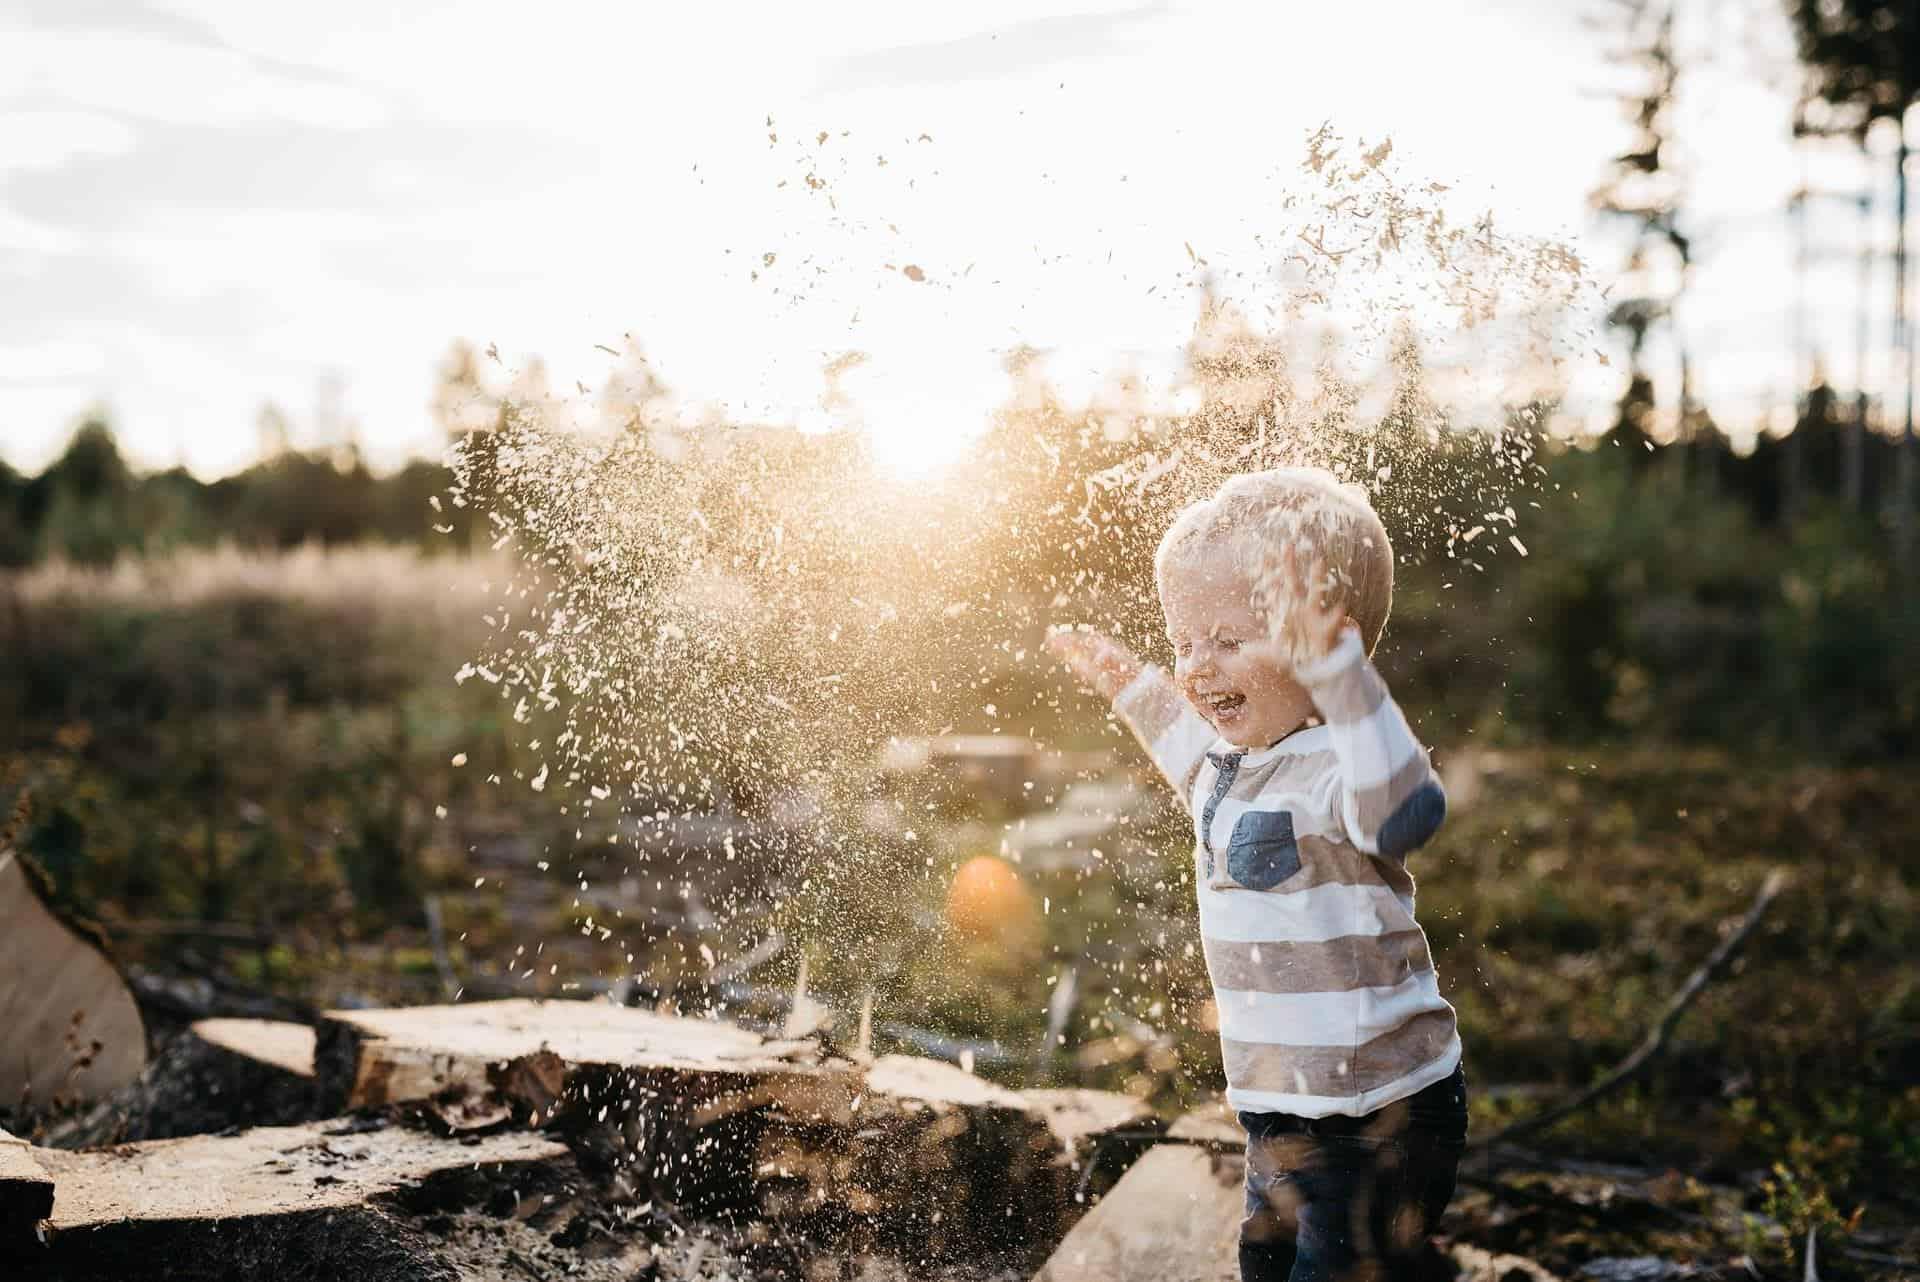 05_Kinderfotos-Fotograf-Muenchen-Kinder_mini